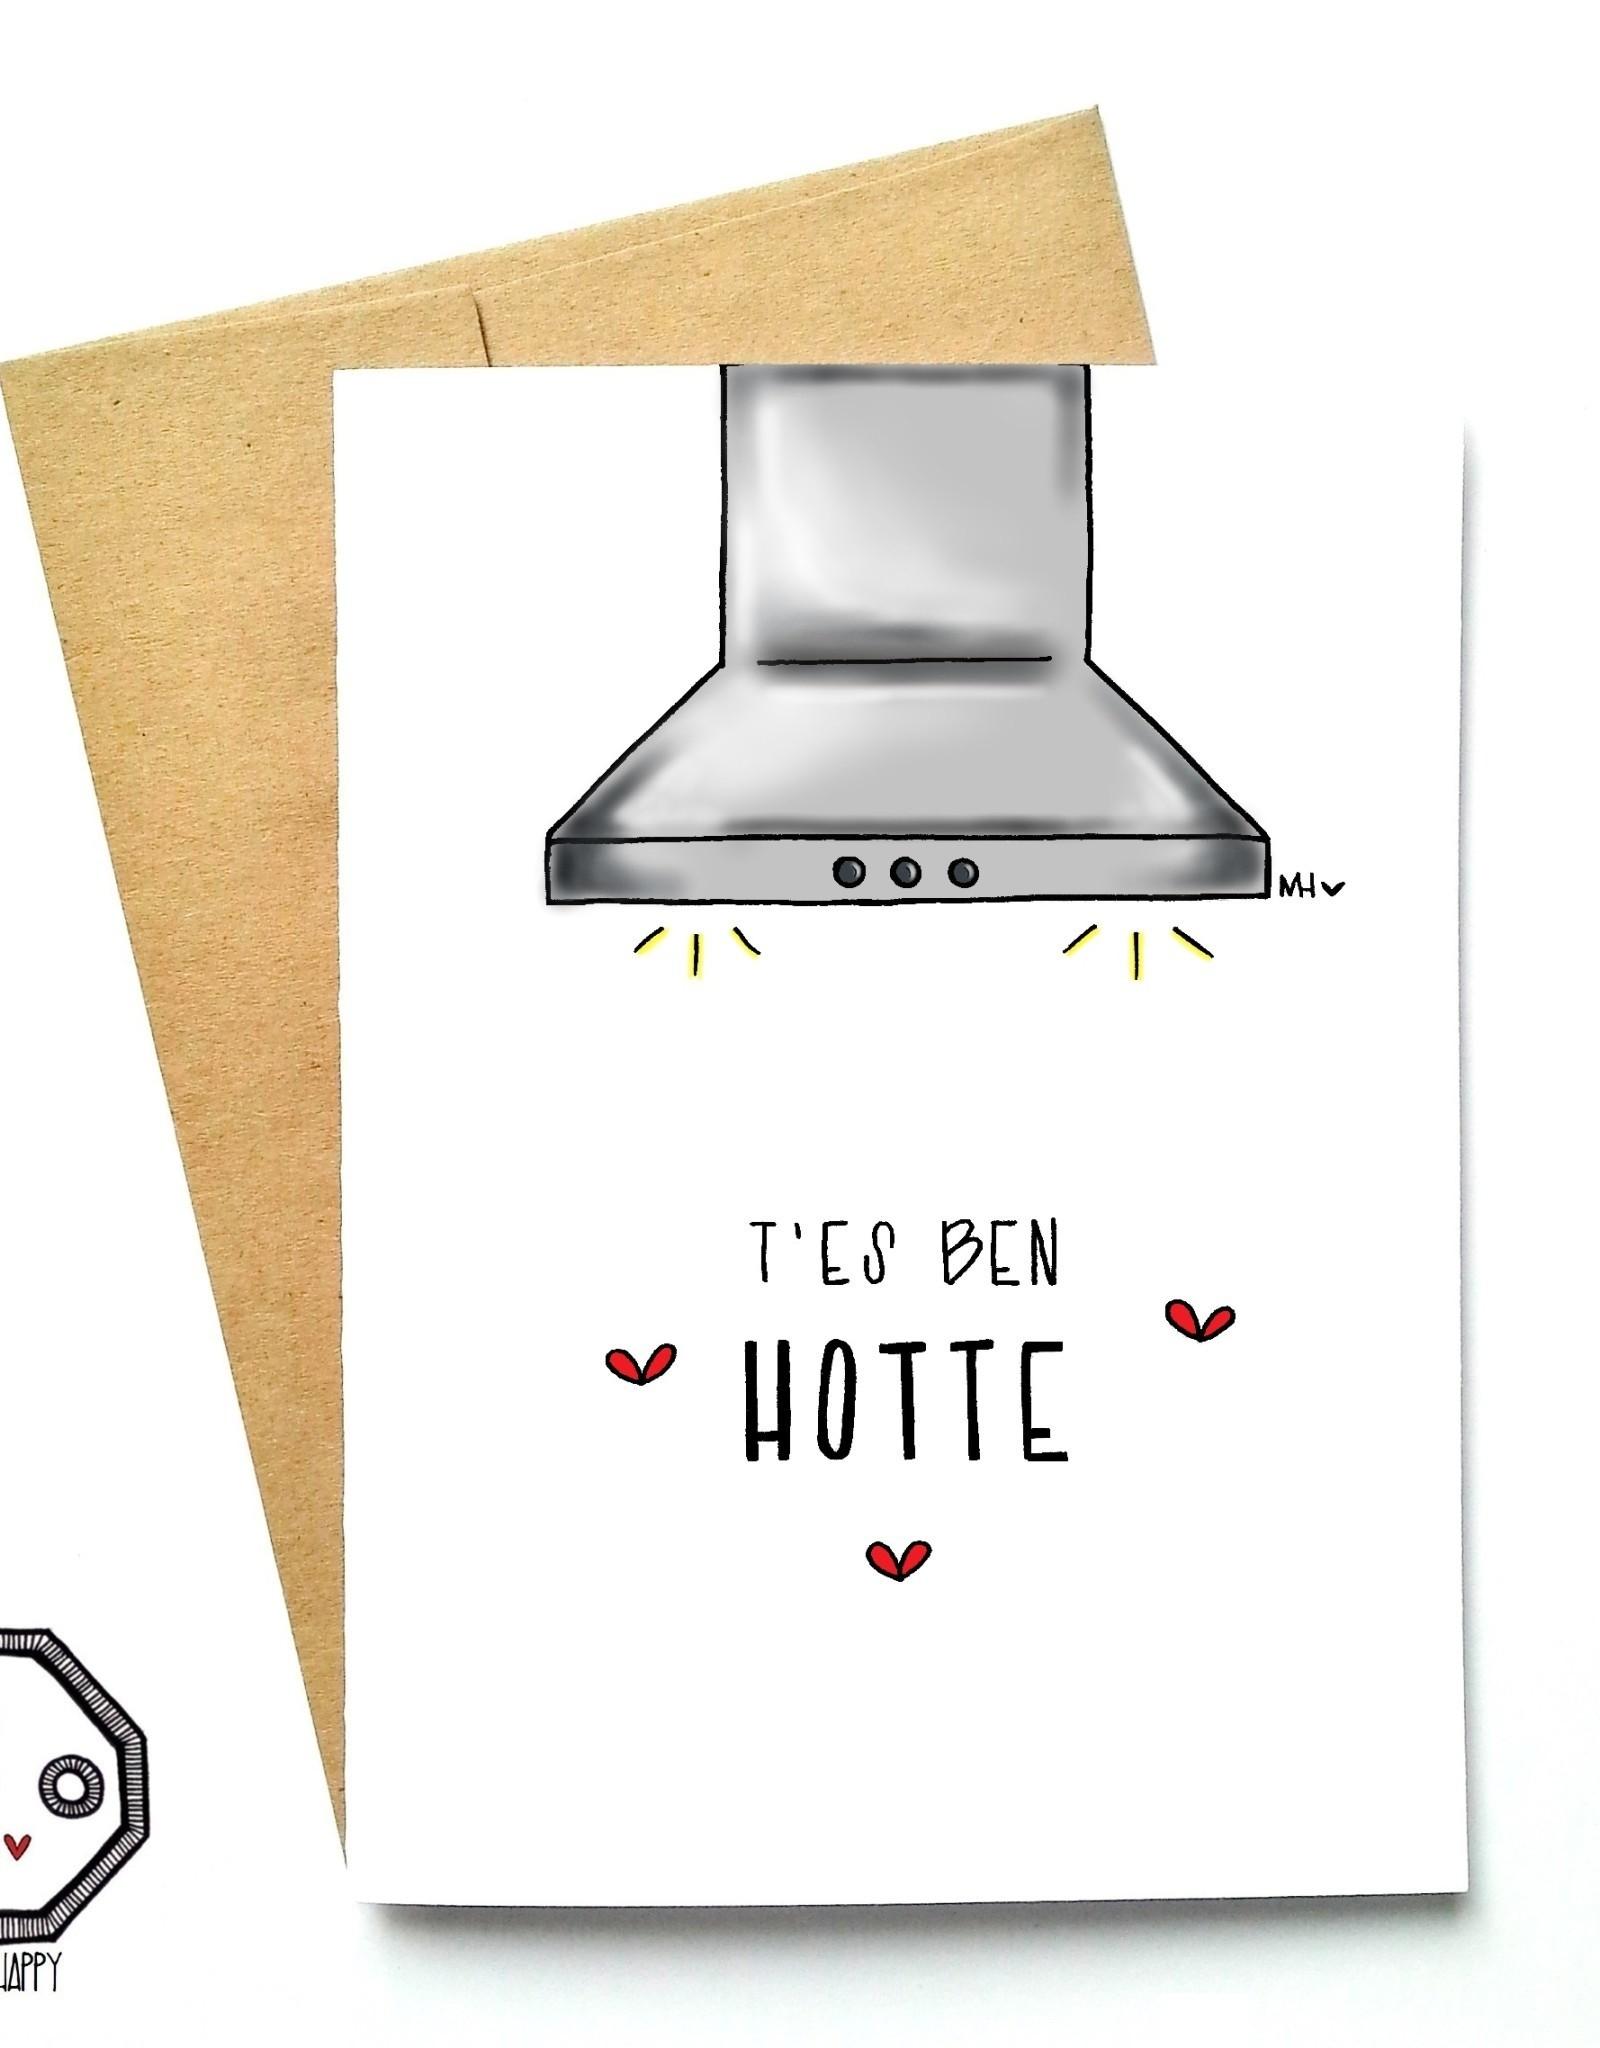 Made in Happy Carte de souhait - T'es ben hotte